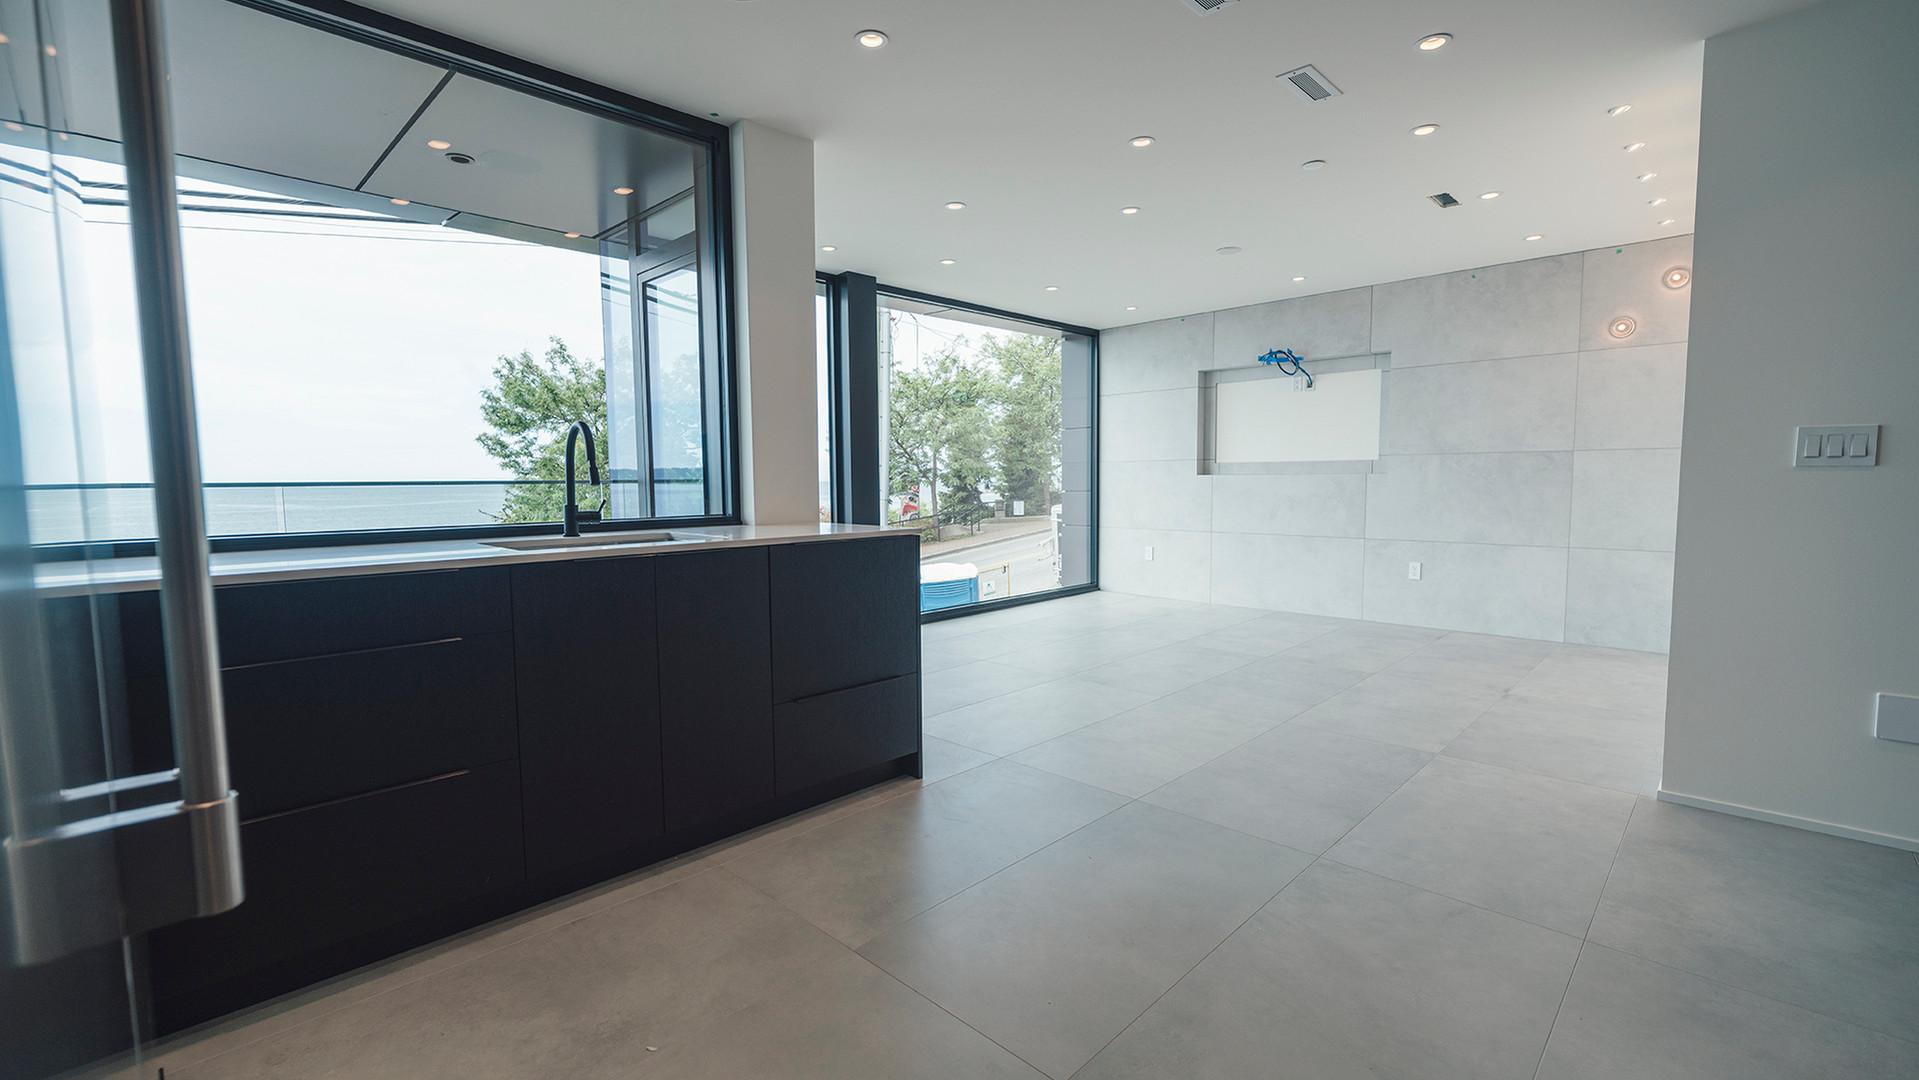 Secondary kitchen & Playroom